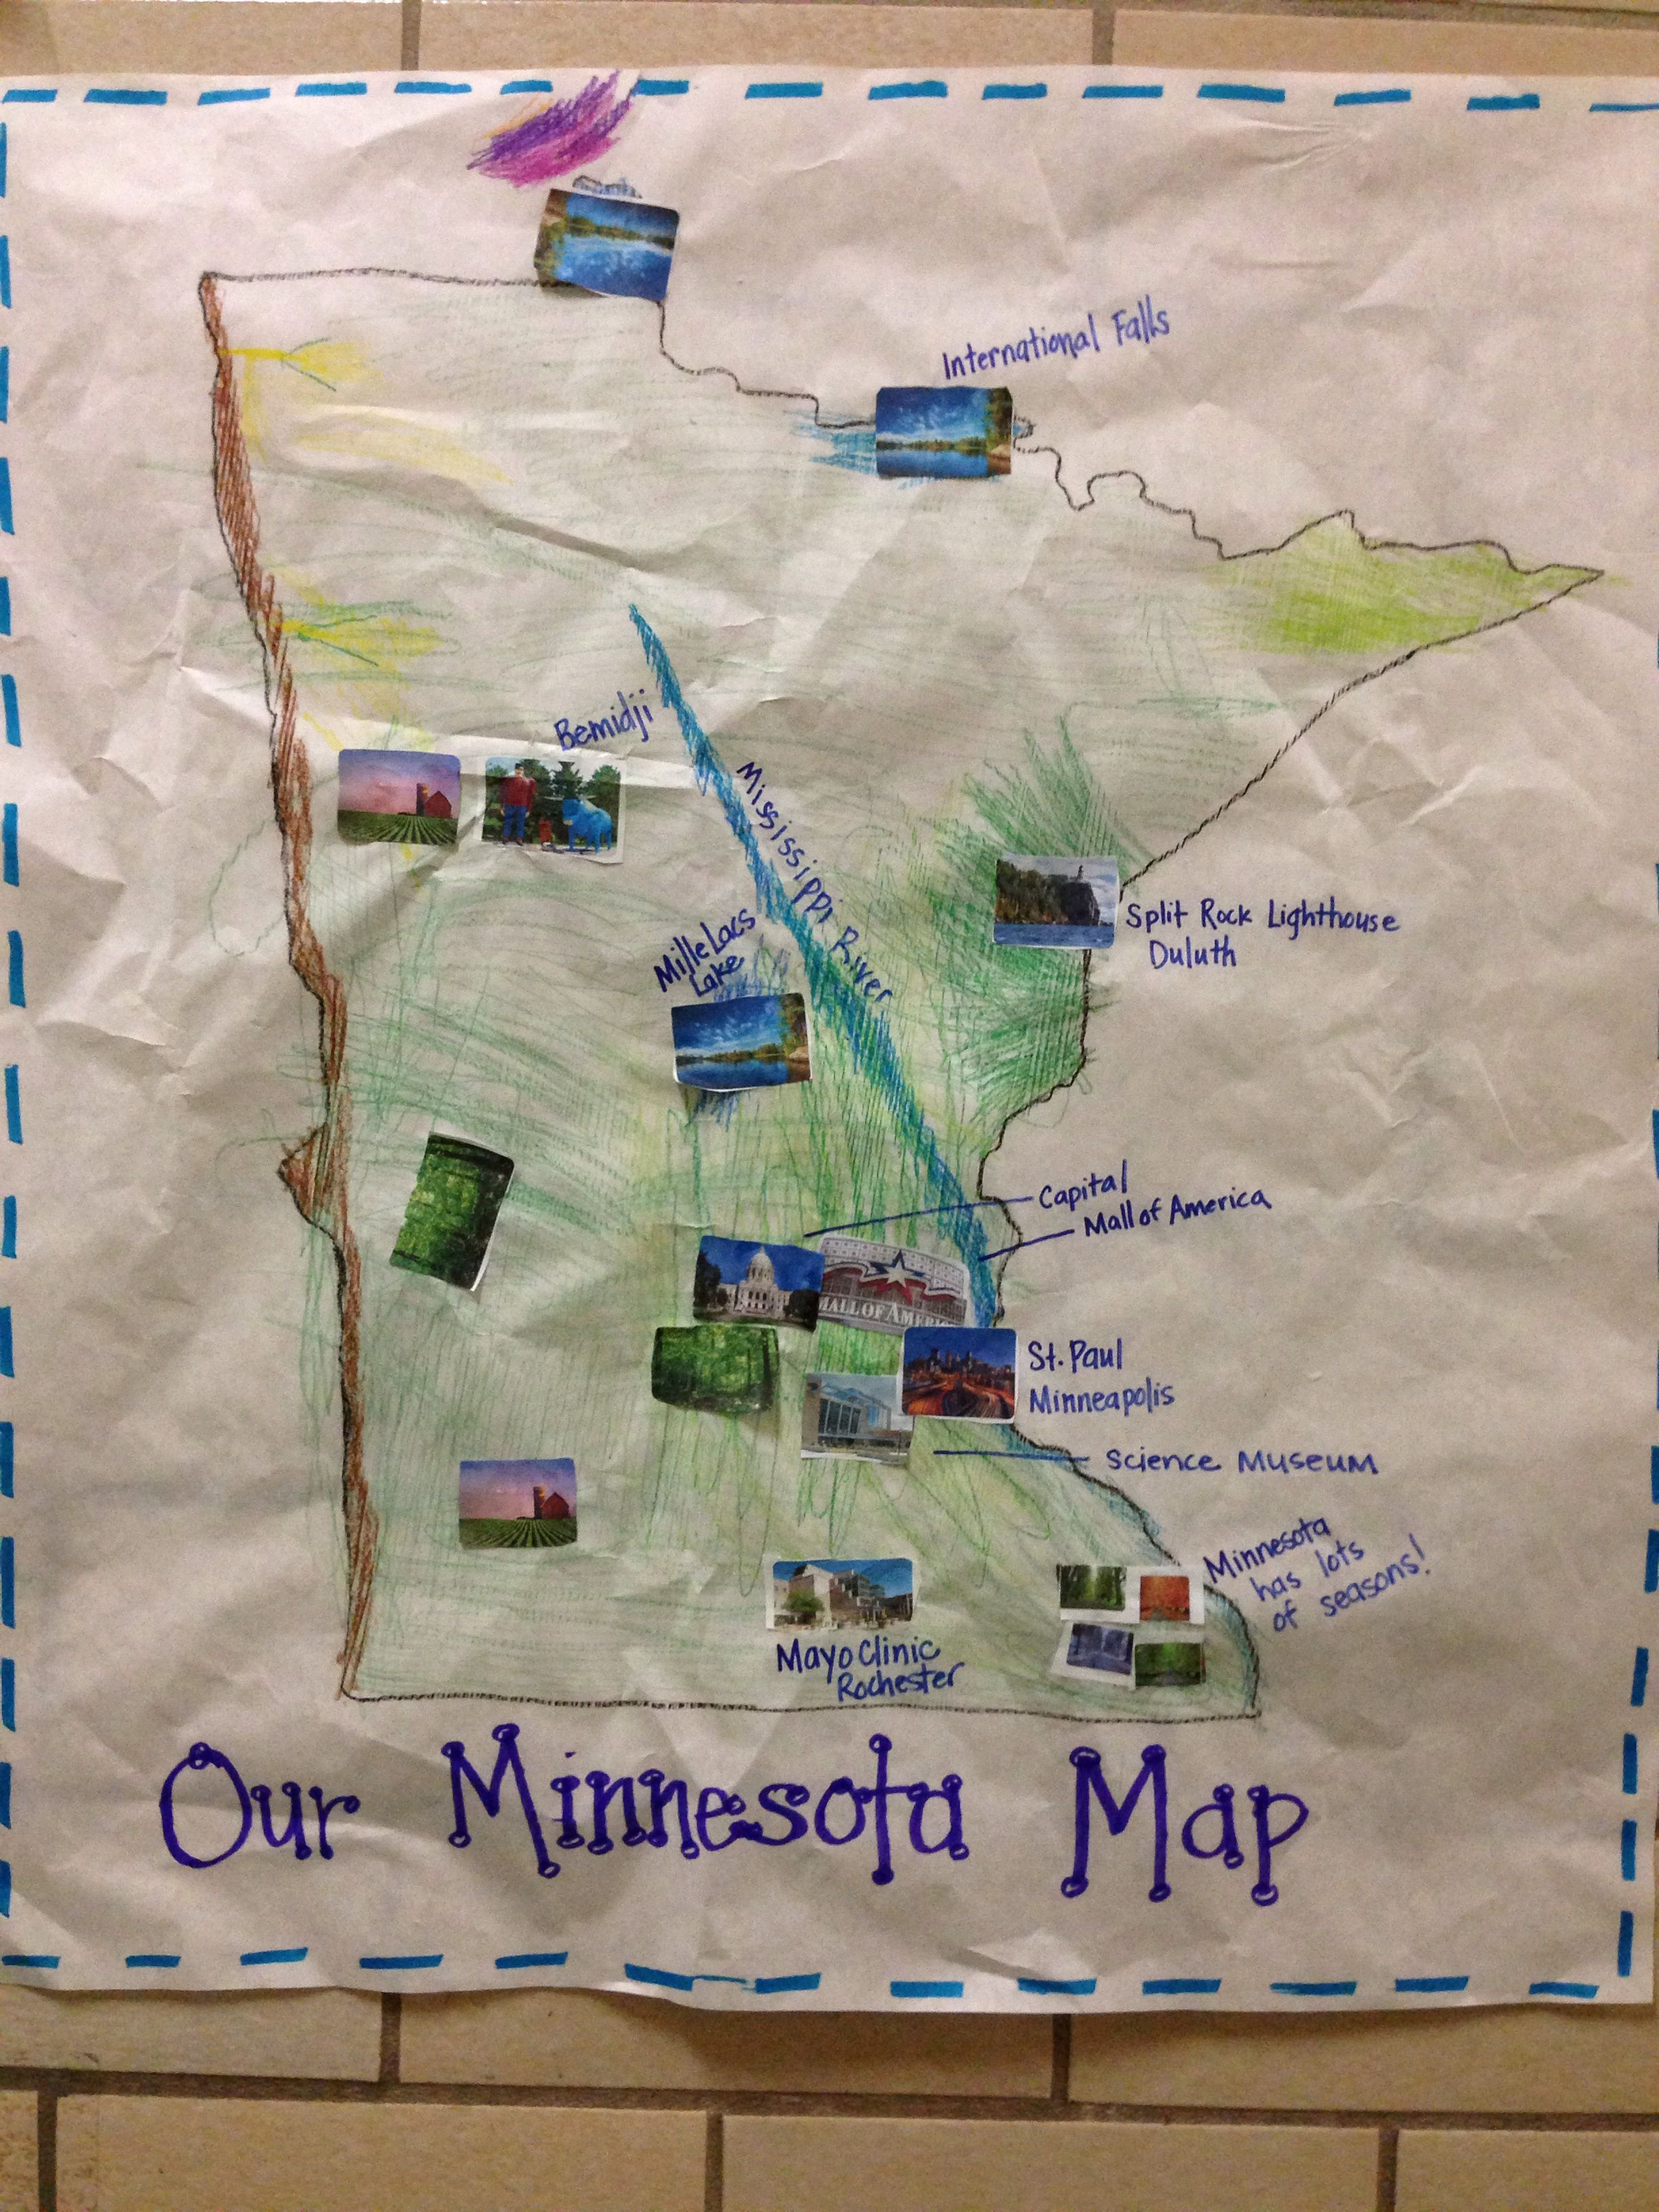 Trace a large outline of Minnesota. Use a map to help add ... on large map of dfw area, large map of chicago area, large map of the netherlands, large map of white mountains, large map of southern england, large map of tennessee state, large map of new hampshire, large map of ny state, large map of green bay, large map of stockton ca, large map of downtown chicago, large map of northern florida, large map of mississippi river, large map of new york city, large map of the world, large map of palm coast, large map of murrieta ca, large map of west texas, large map of new england, large map of china provinces,